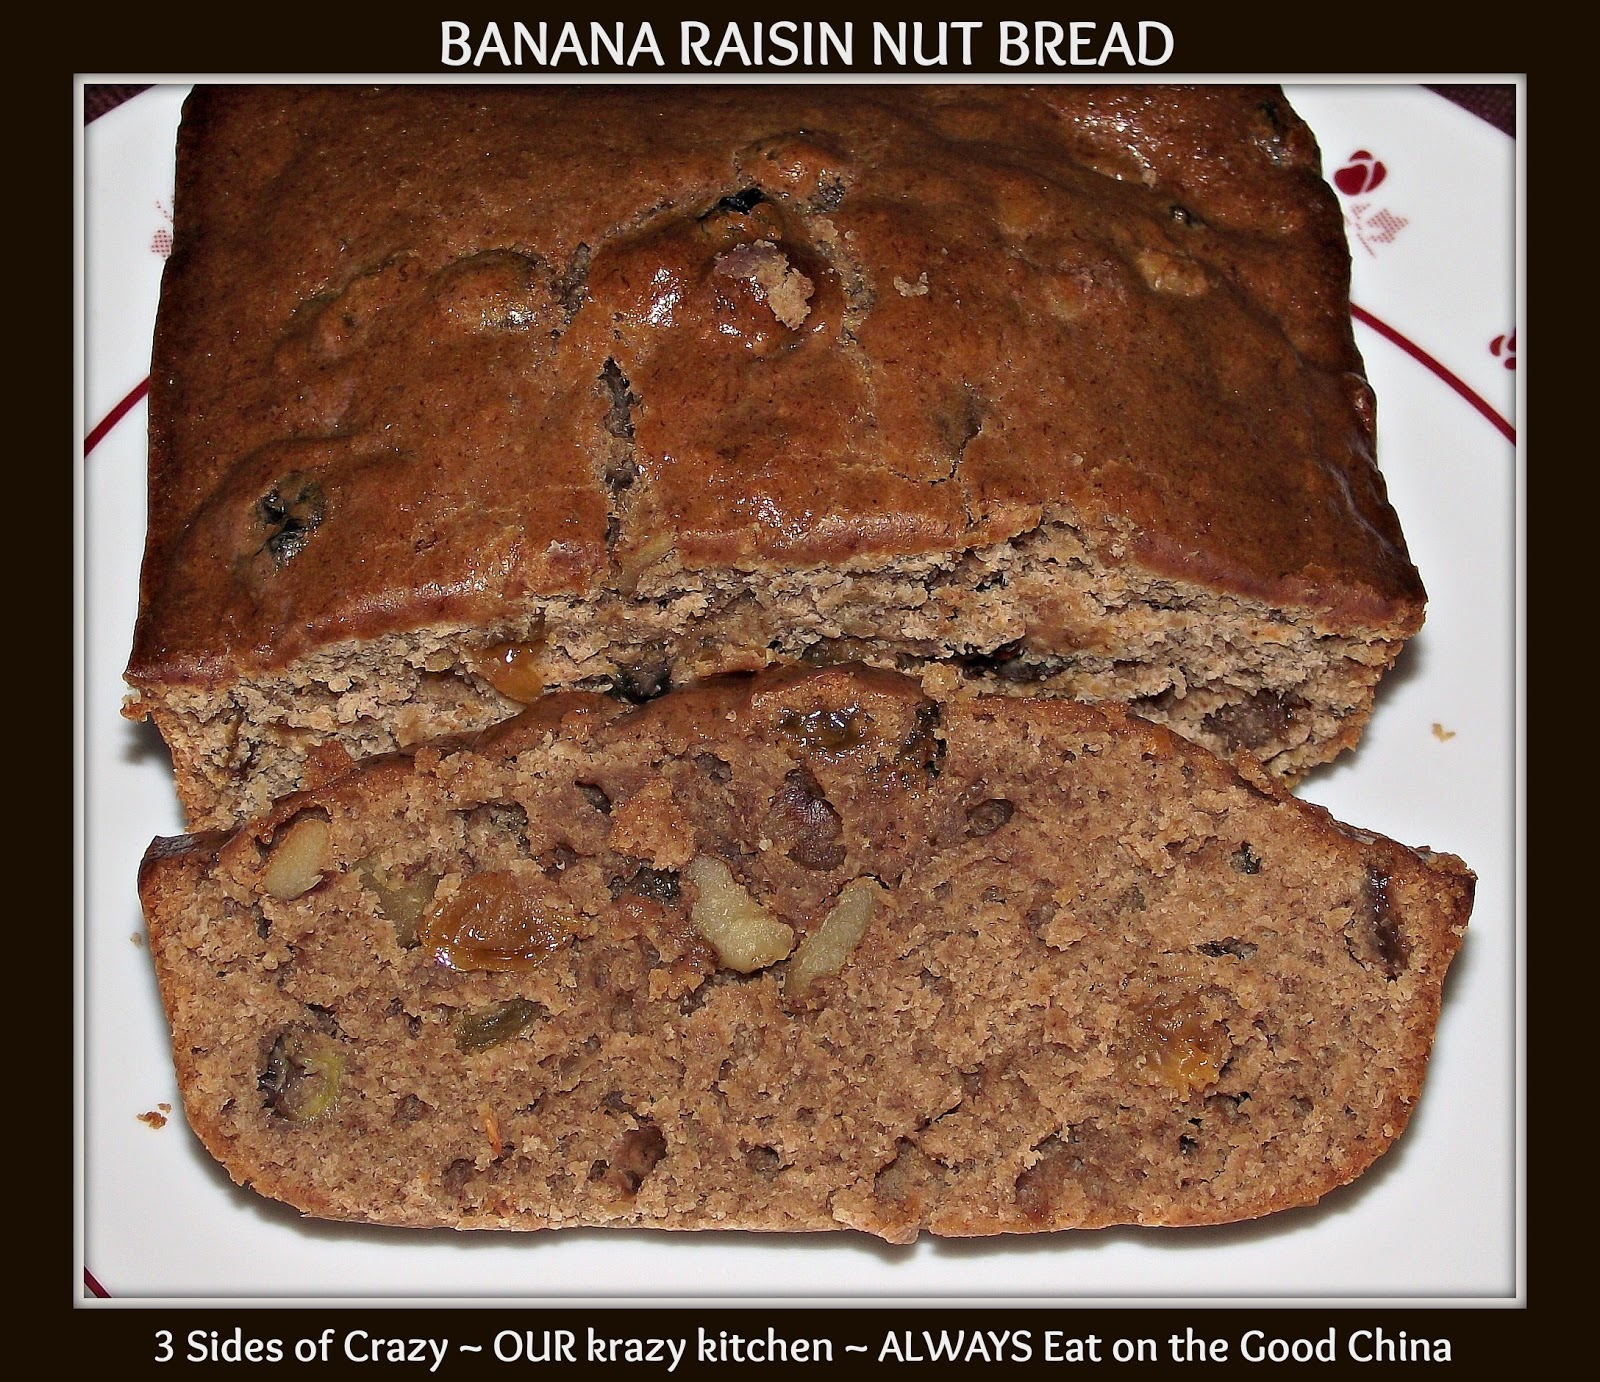 ... Eat On the Good China: BANANA RAISIN NUT BREAD OR CAKE - RECIPE REWIND